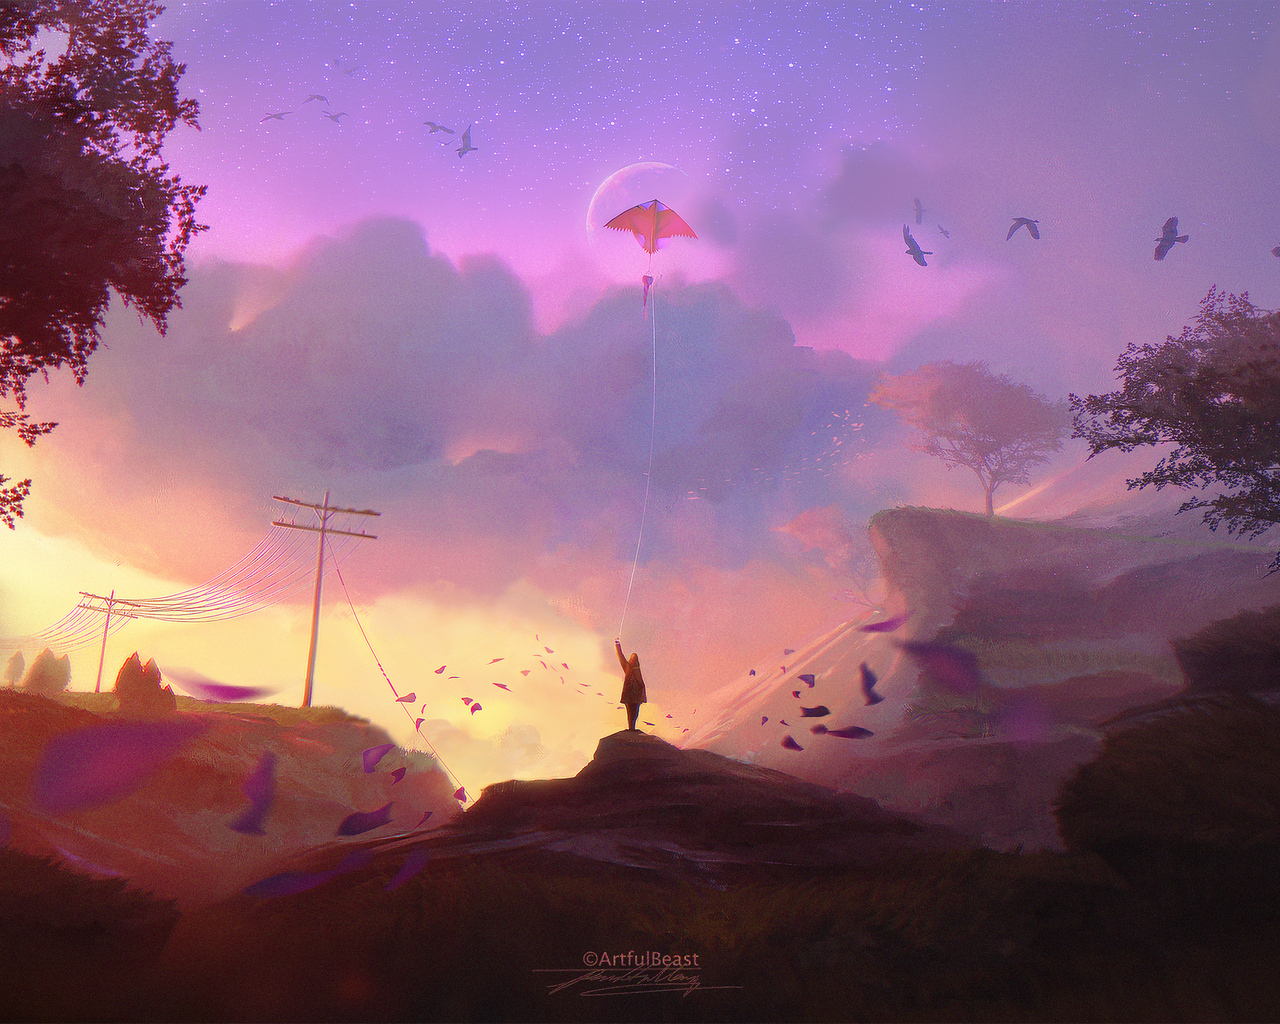 child-flying-kite-fantasy-digital-art-37.jpg